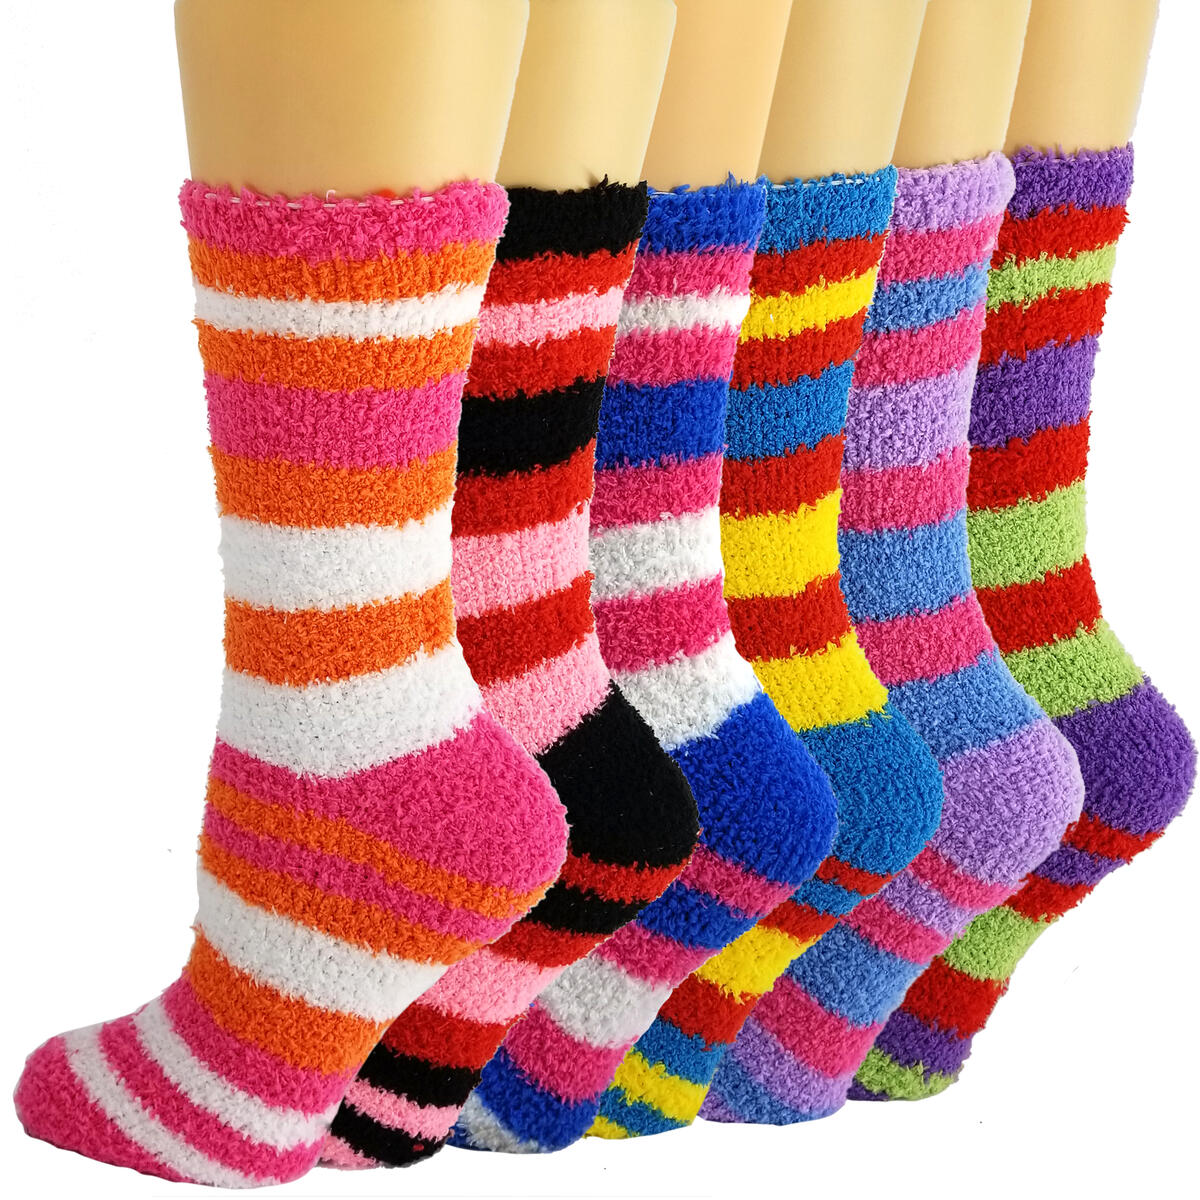 Debra Weitzner Womens Fuzzy Socks 6 Pack Plush Slipper Socks Microfiber Soft Anti Slip